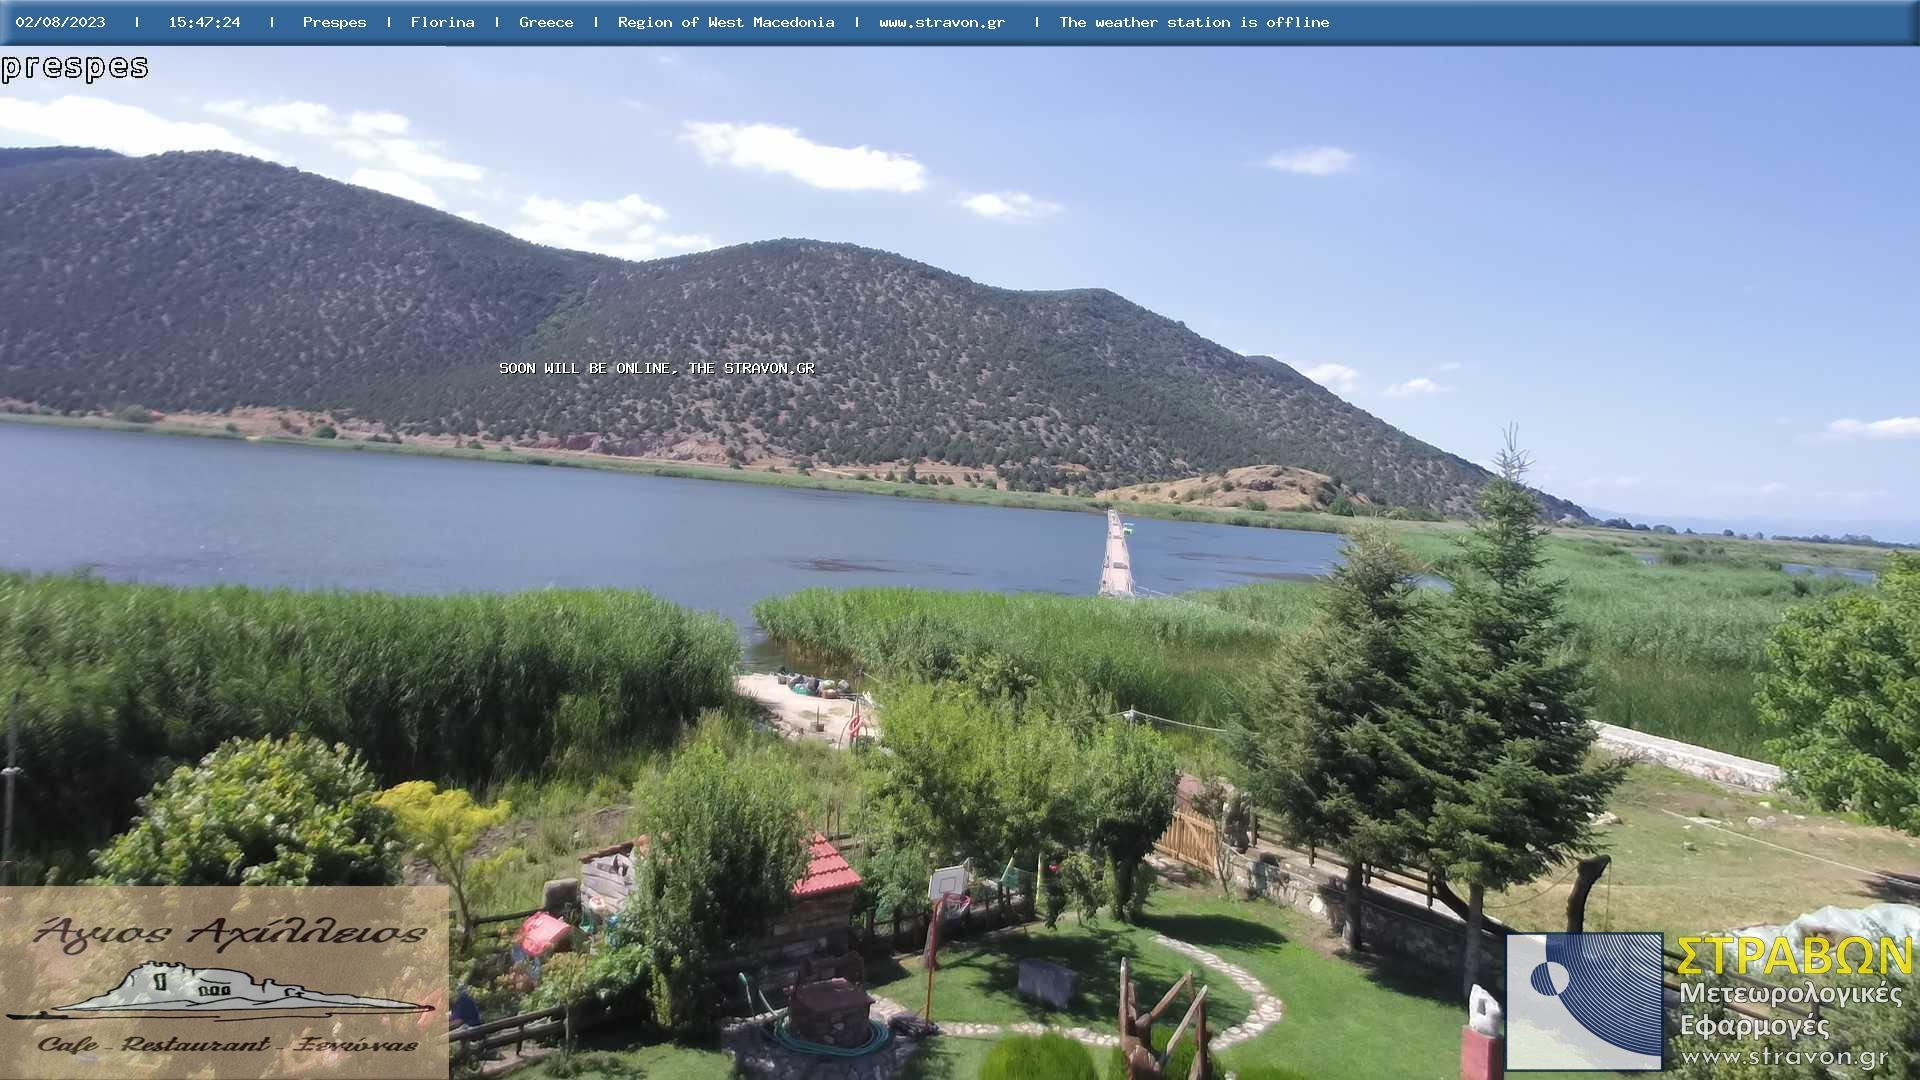 http://stravon.gr/meteocams/prespes/